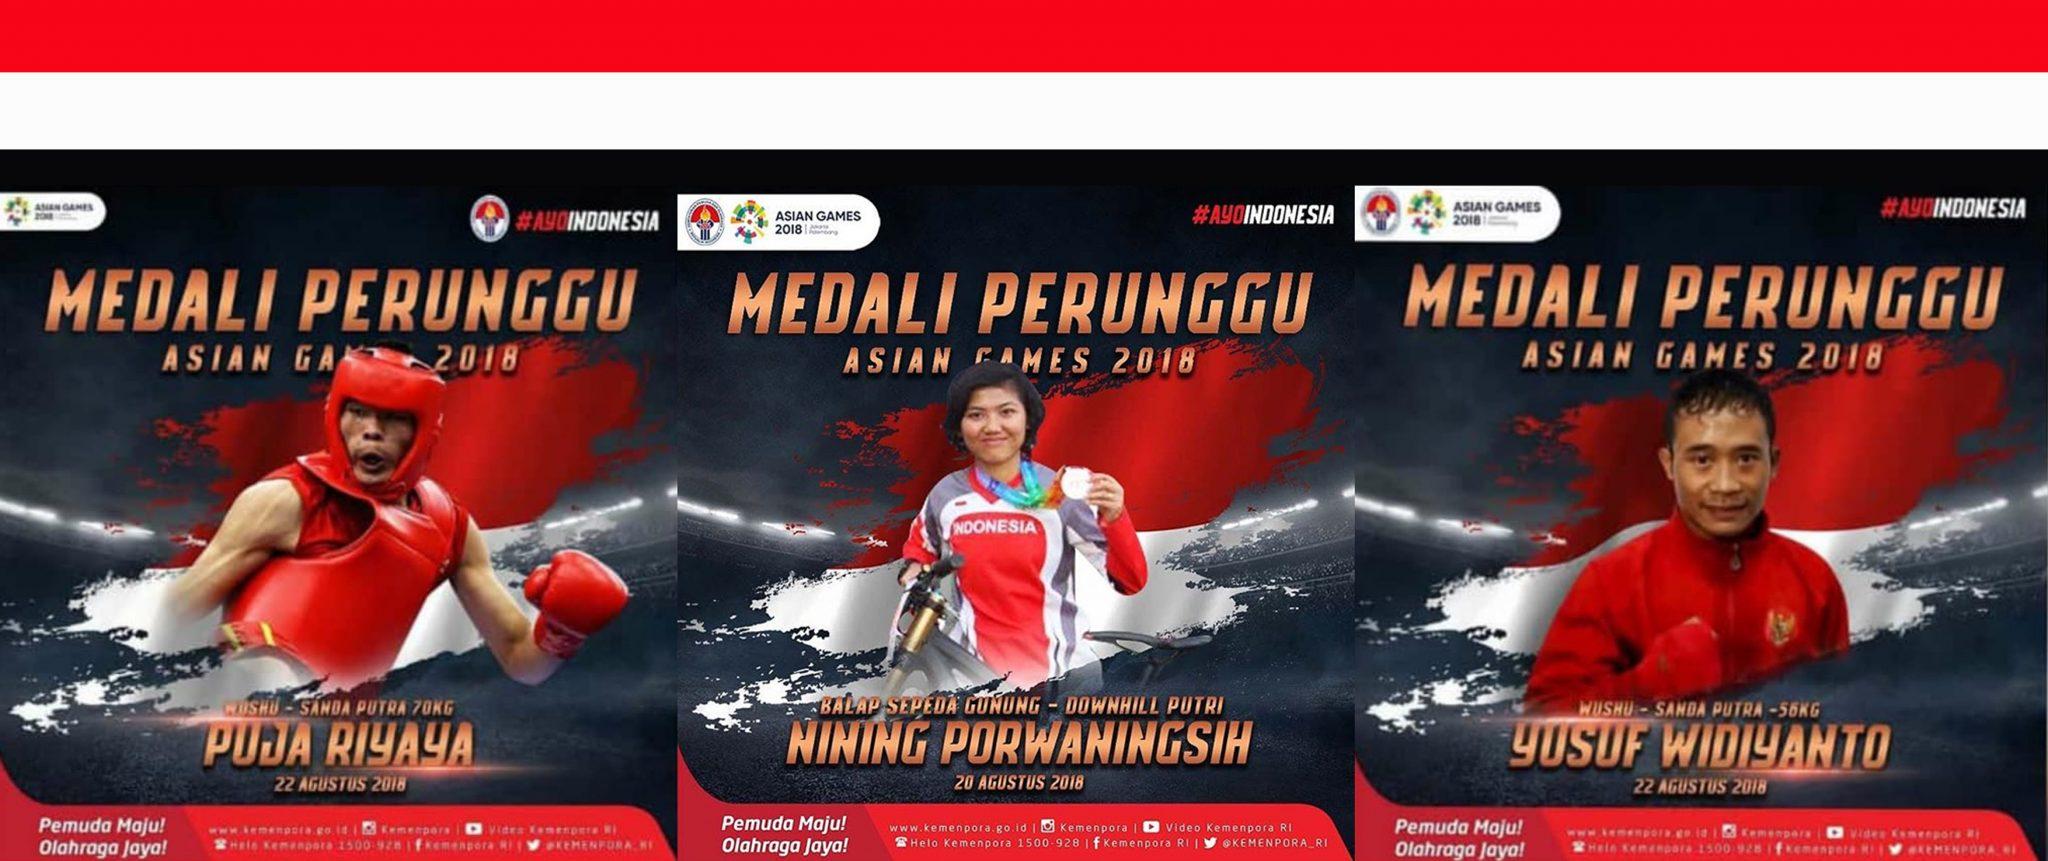 Mahasiswa UNNES Ukir Prestasi Di Asian Games Jakarta-Palembang 2018